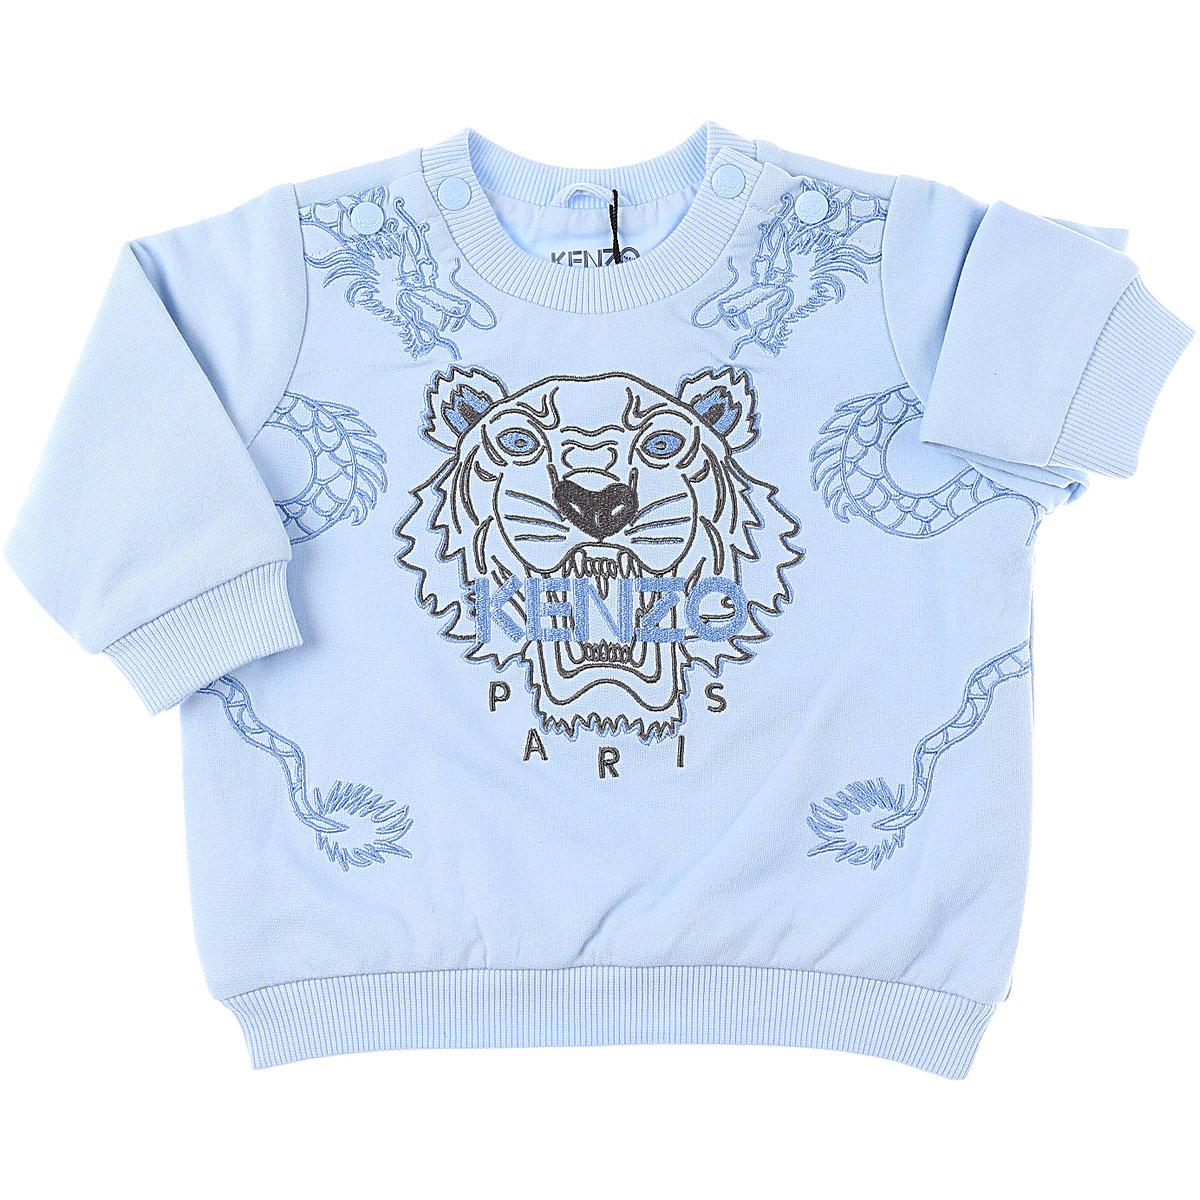 Kenzo Baby Sweatshirts & Hoodies for Boys On Sale, Sky, Cotton, 2019, 12 M 18M 3M 6M 9M